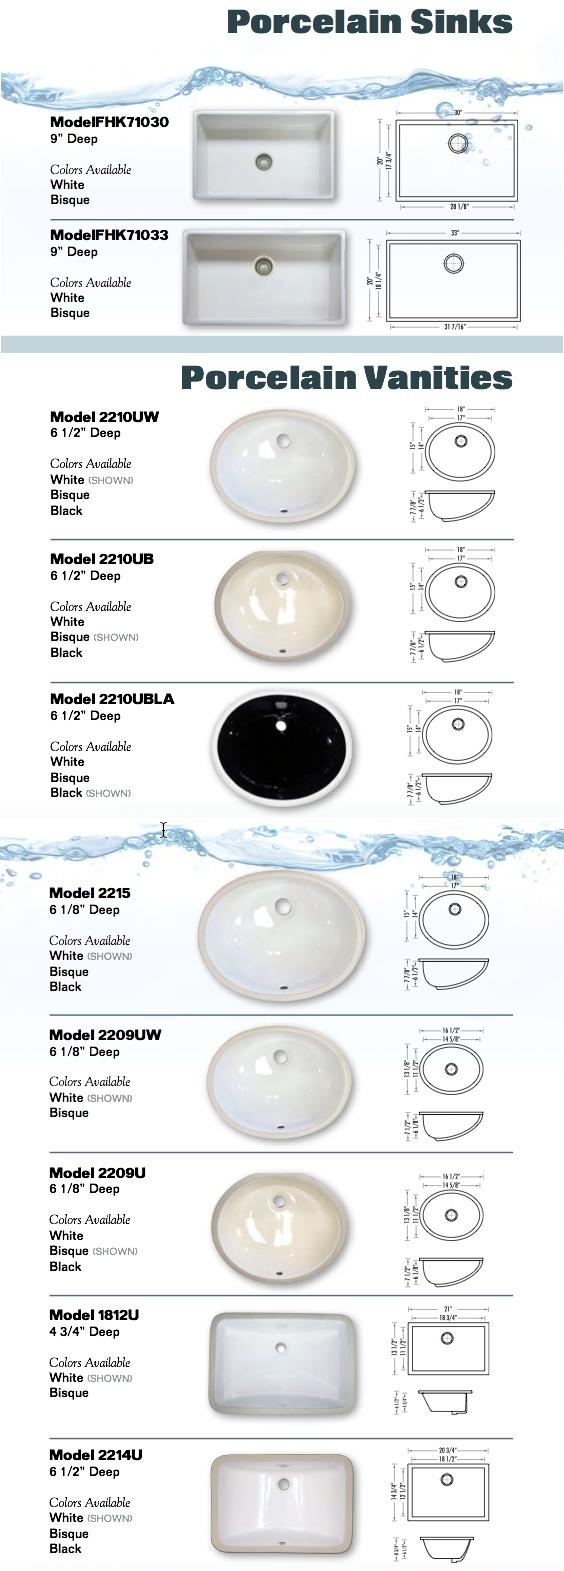 Porcelain Sinks